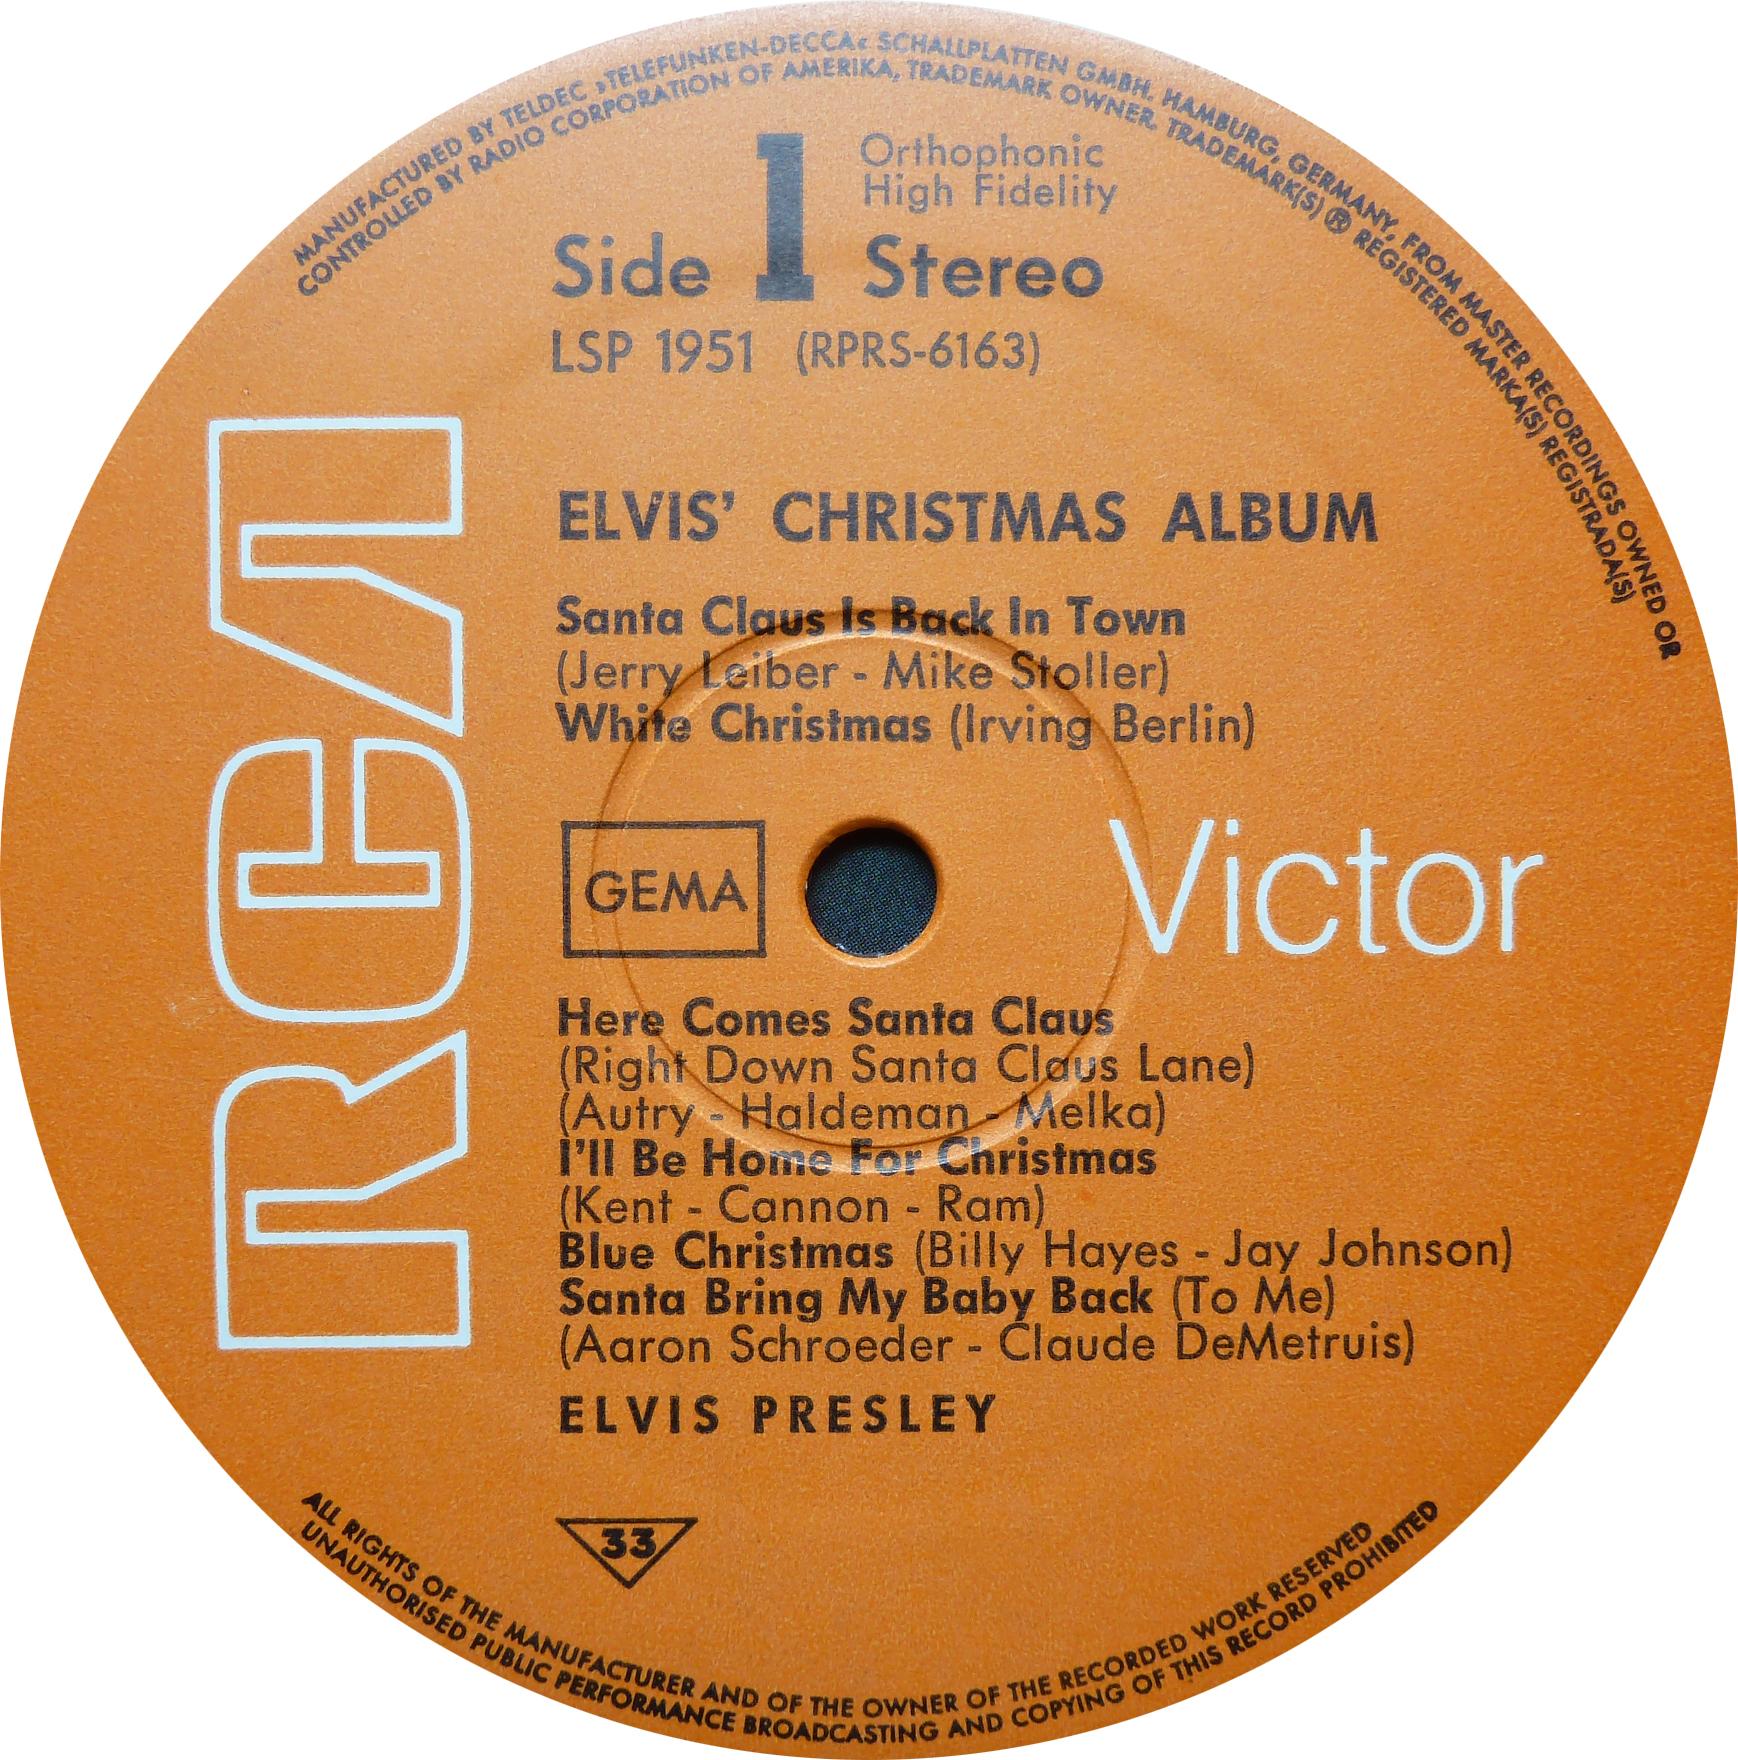 ELVIS' CHRISTMAS ALBUM (1964) Christmasalbum1968sid0wuoc